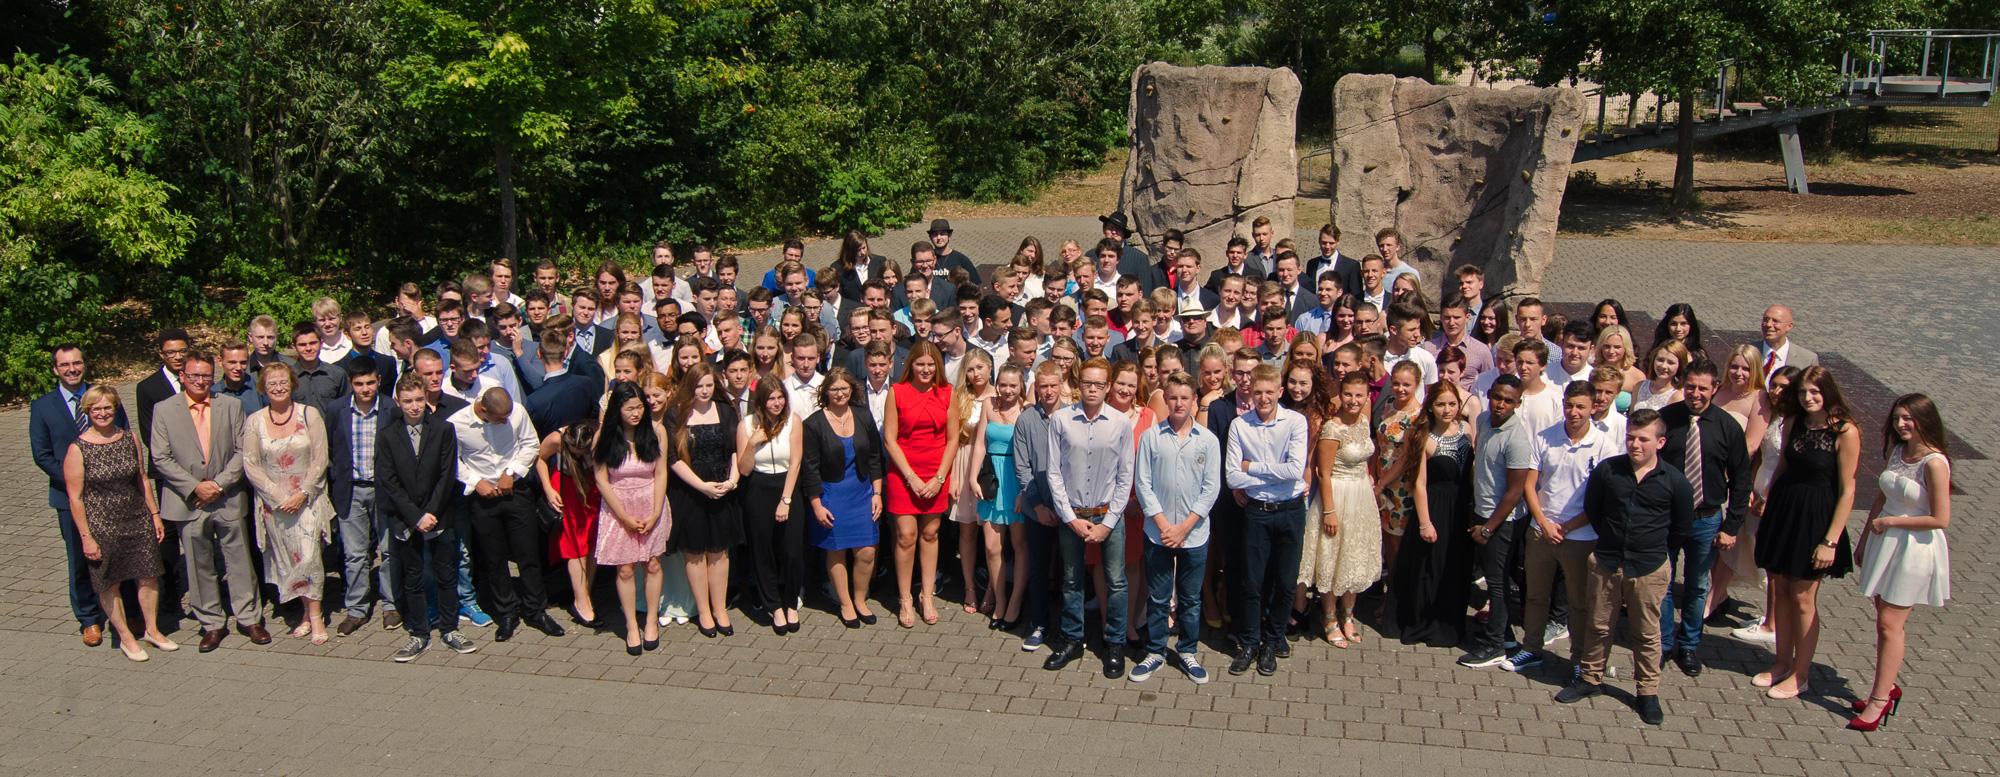 166 Absolventen verlassen die Boeselager-Realschule